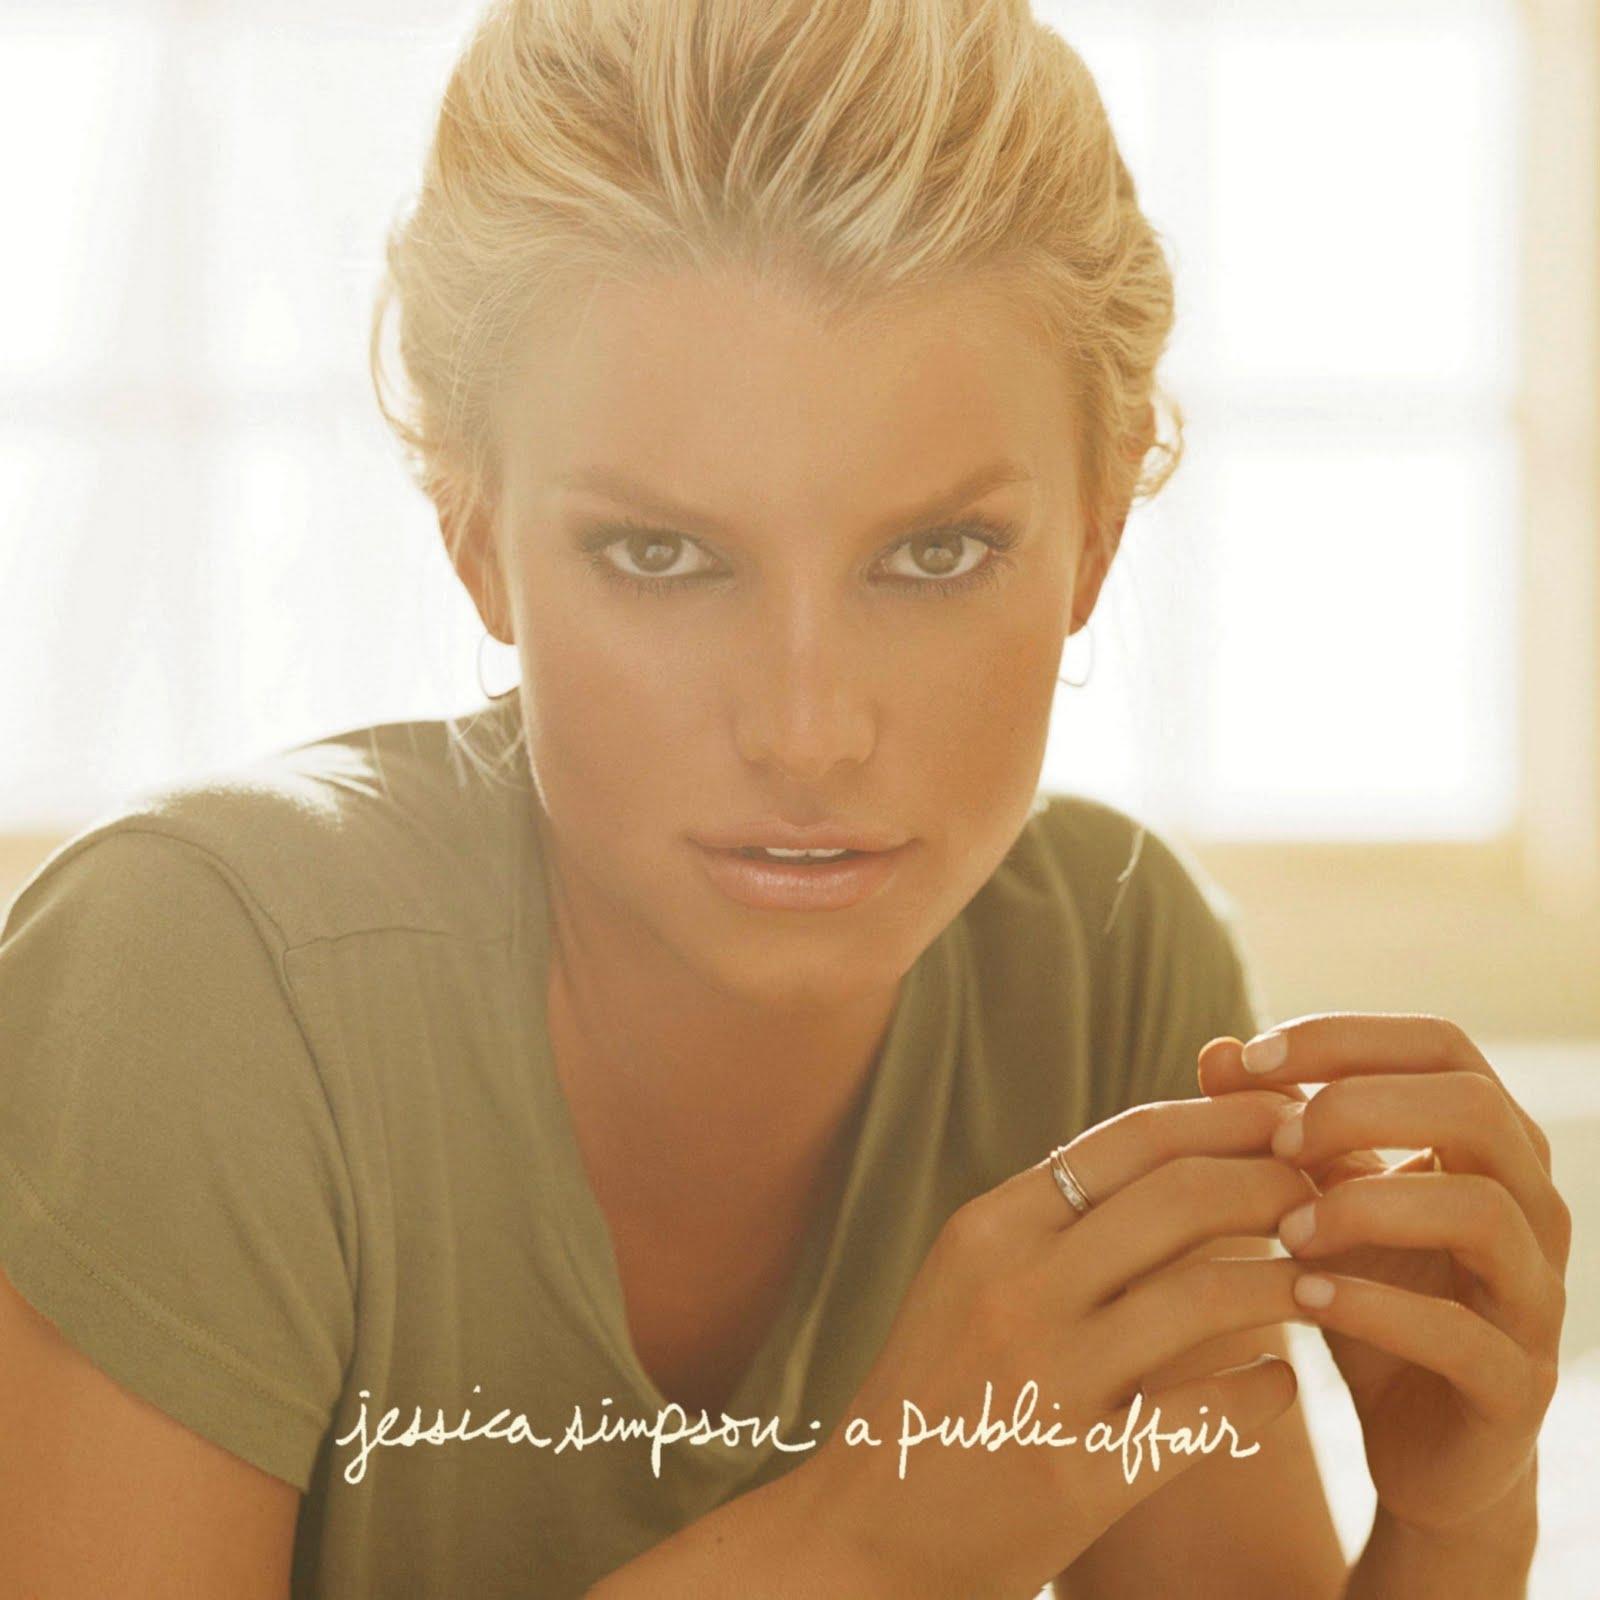 00-jessica_simpson-a_public_affair-2006-front.jpg